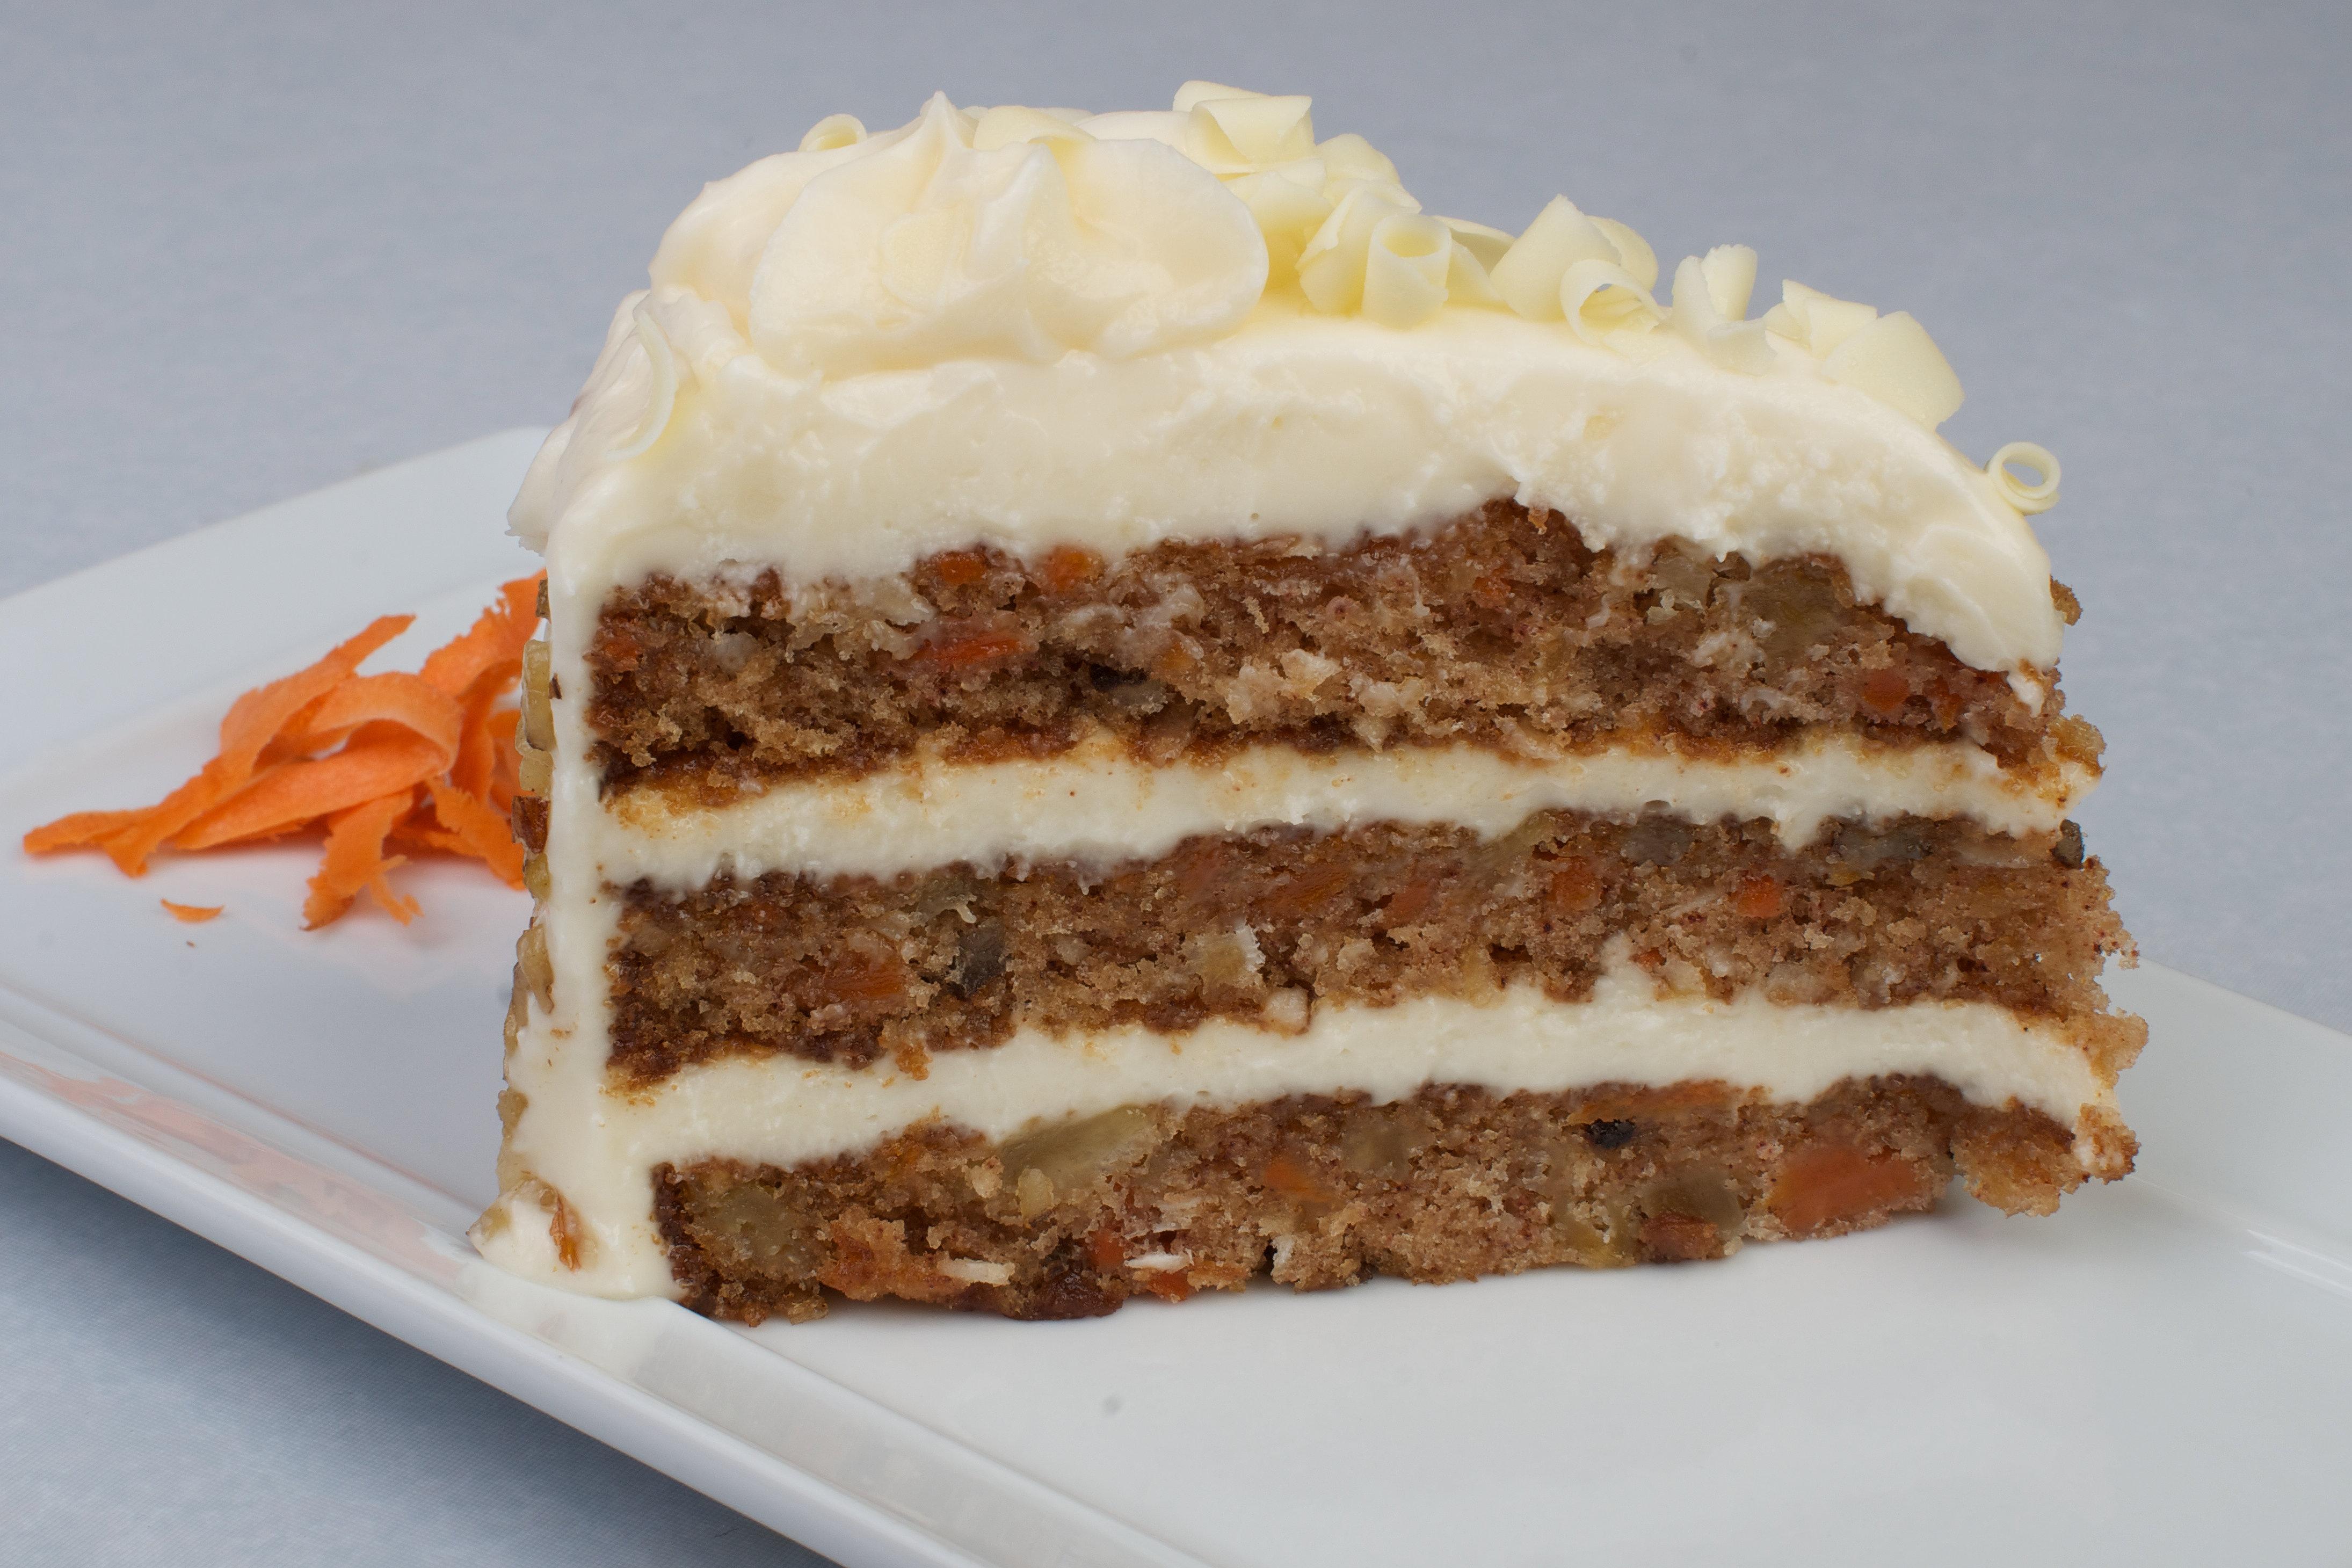 The Gourmet Cake